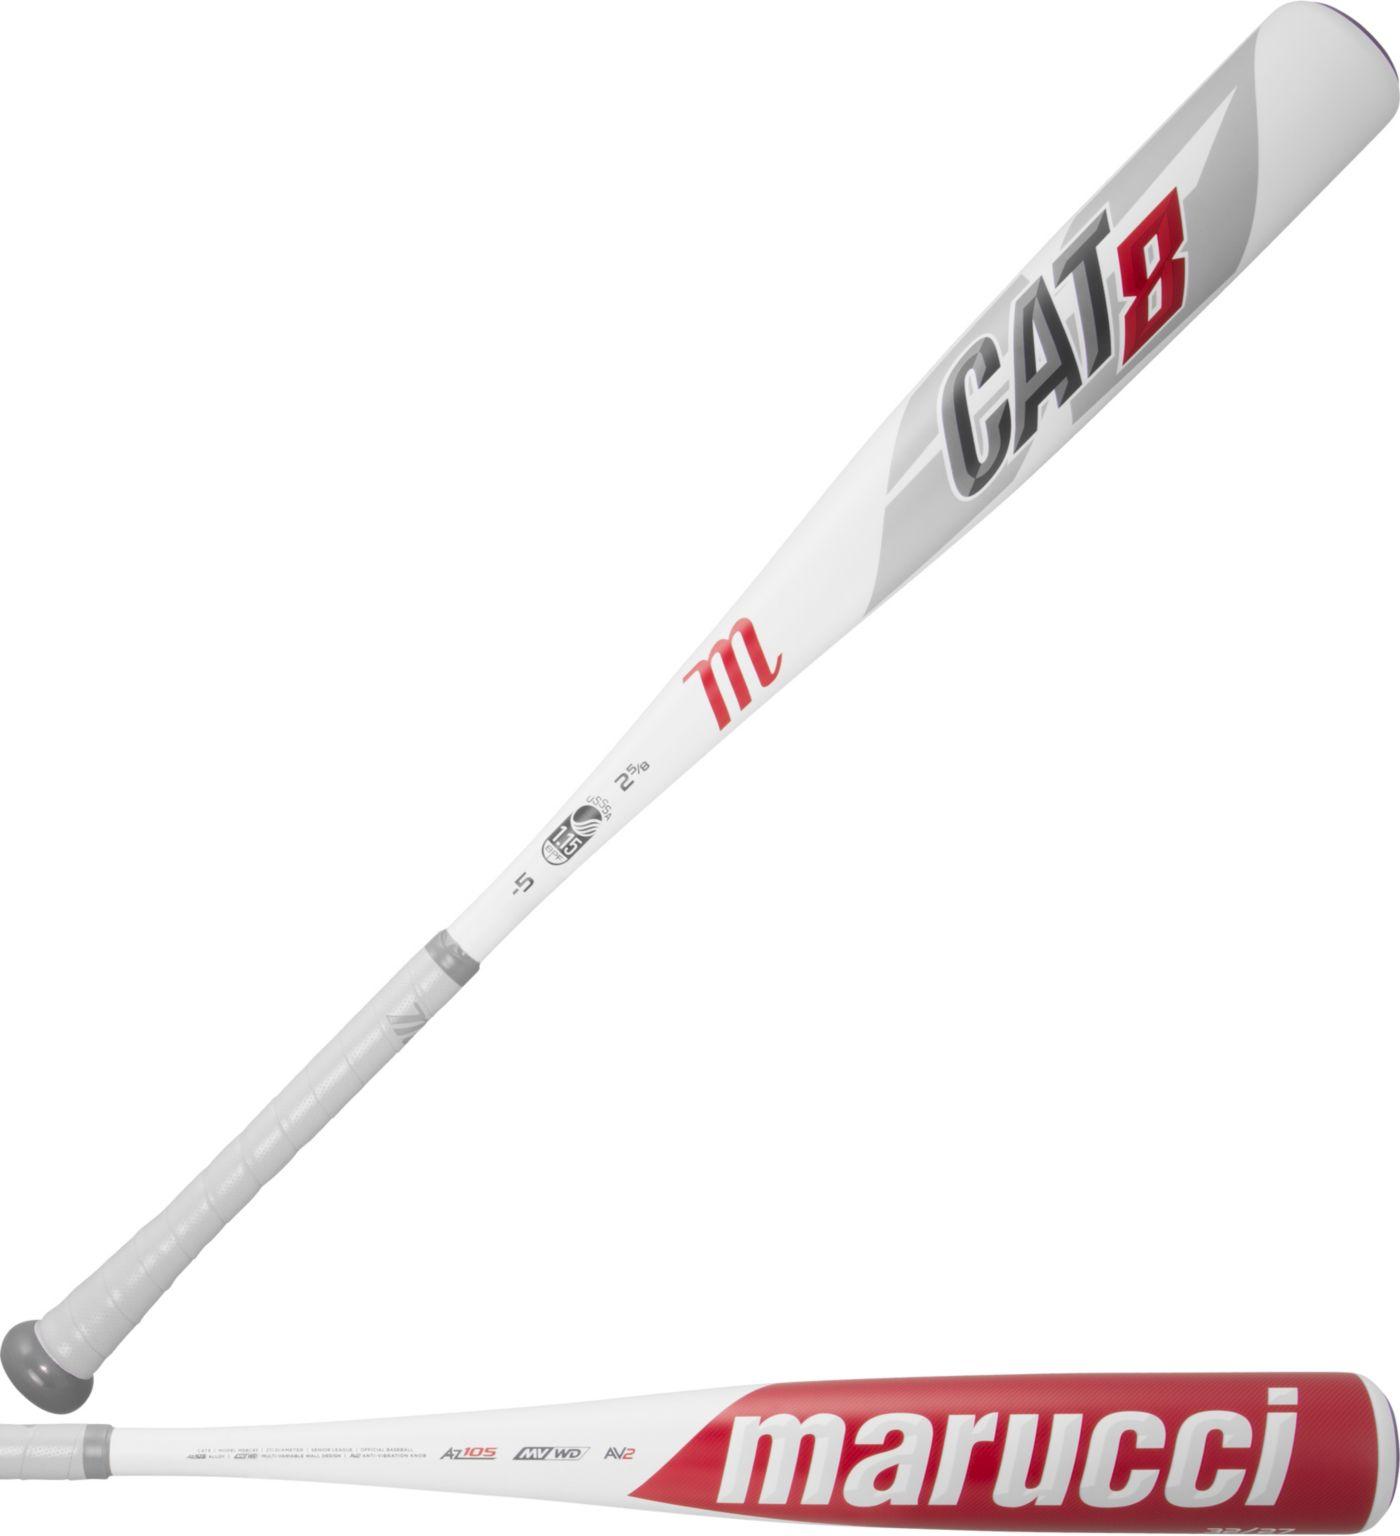 Marucci CAT8 USSSA Bat 2019 (-5)